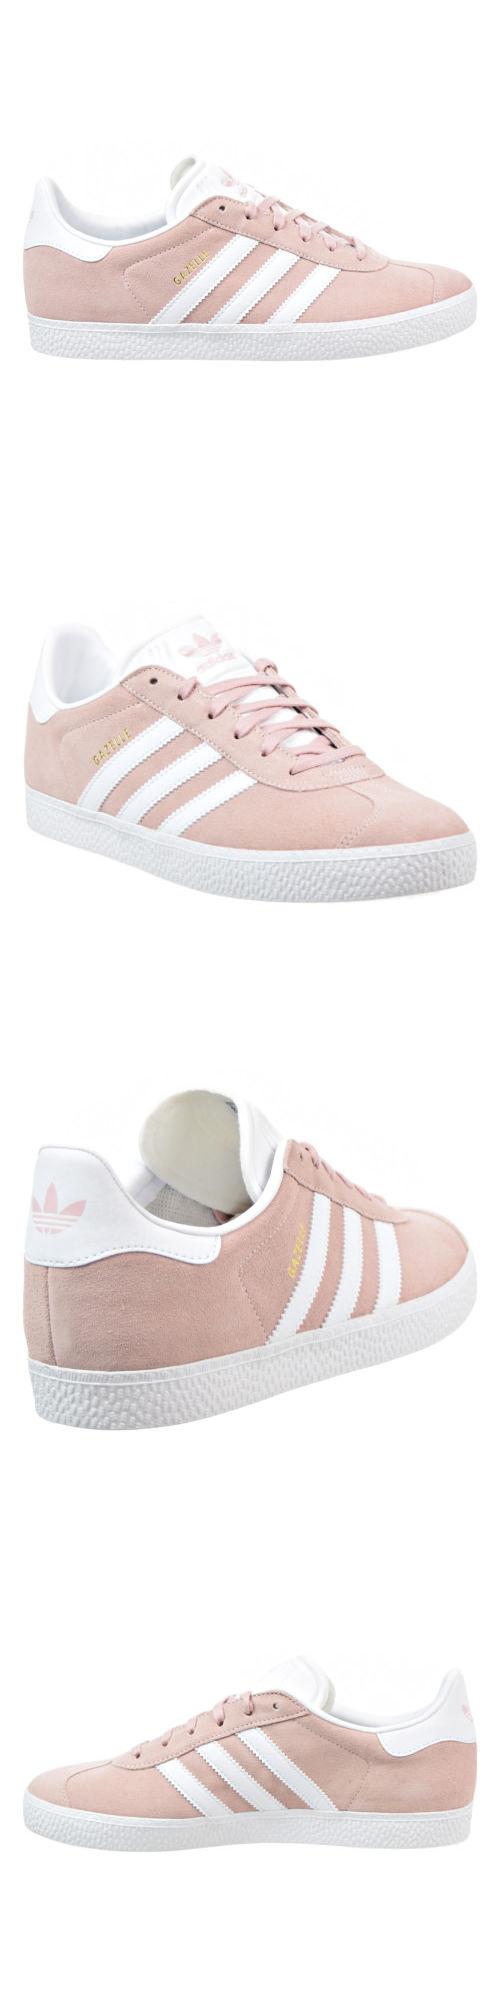 Unisex Shoes 155202  Adidas Gazelle J Big Kids Shoes Ice-Pink Gold White  By9544 5838e2379